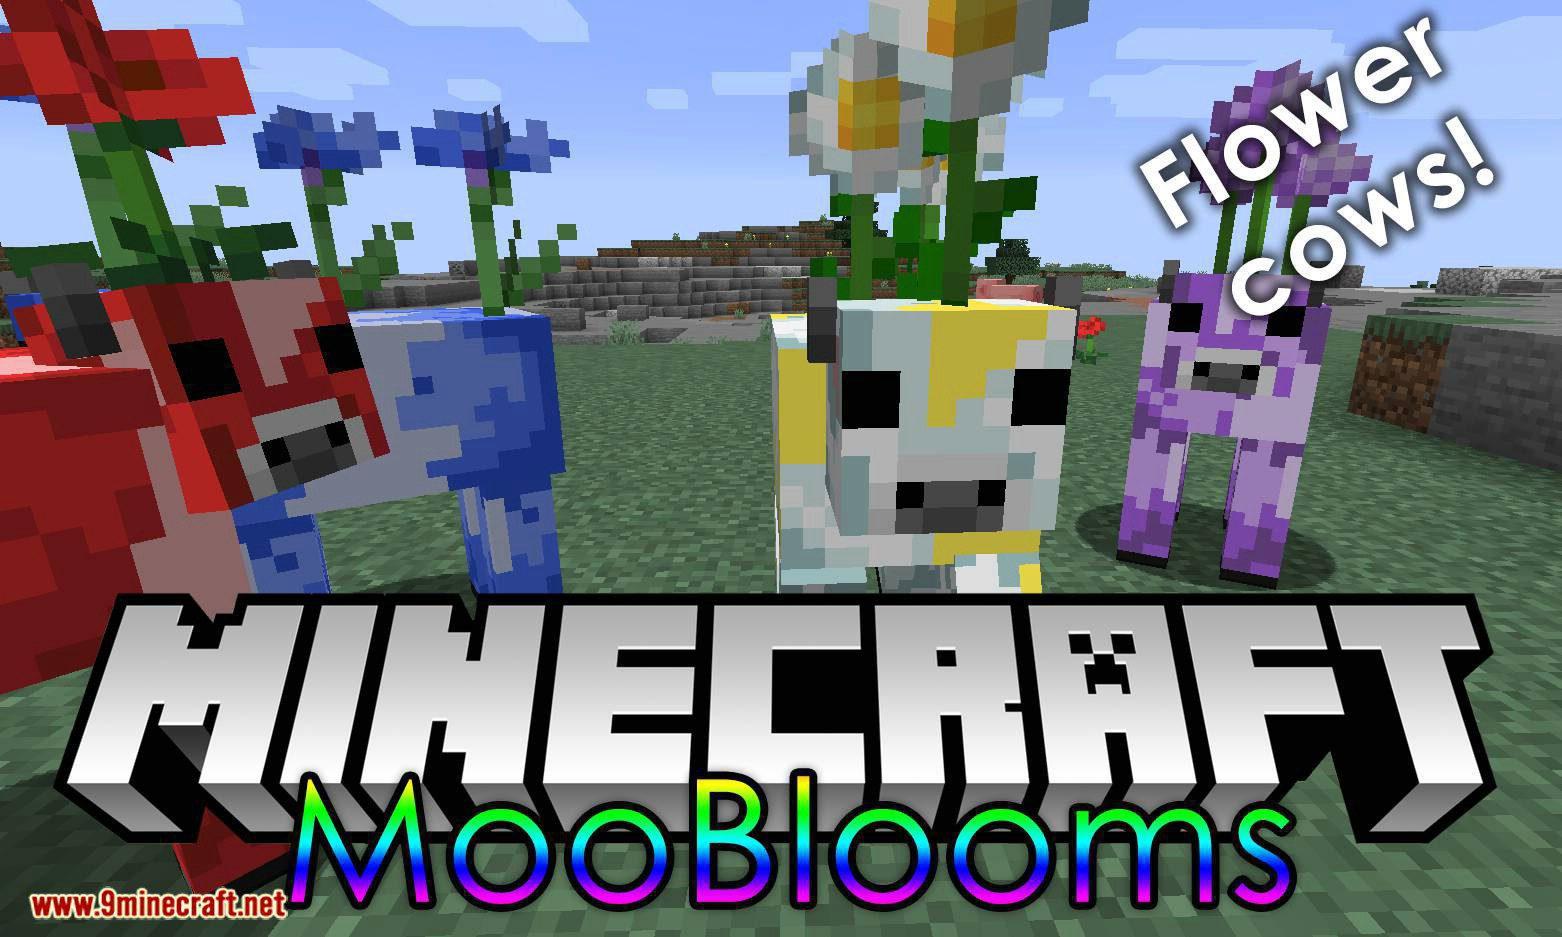 Mooblooms mod for minecraft logo